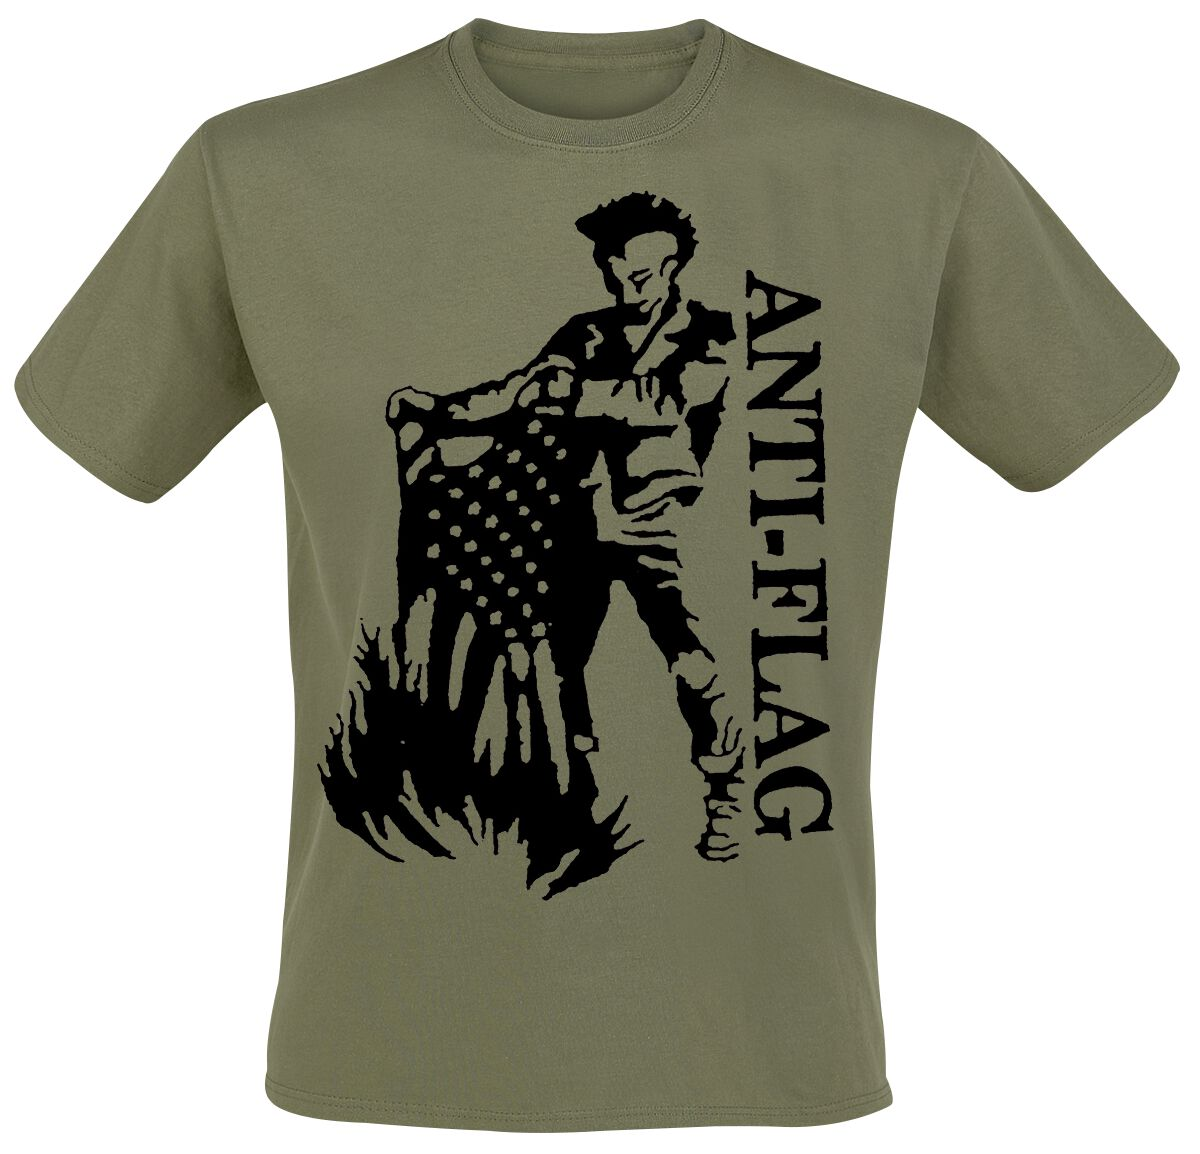 Zespoły - Koszulki - T-Shirt Anti-Flag Flagburner T-Shirt oliwkowy - 368310